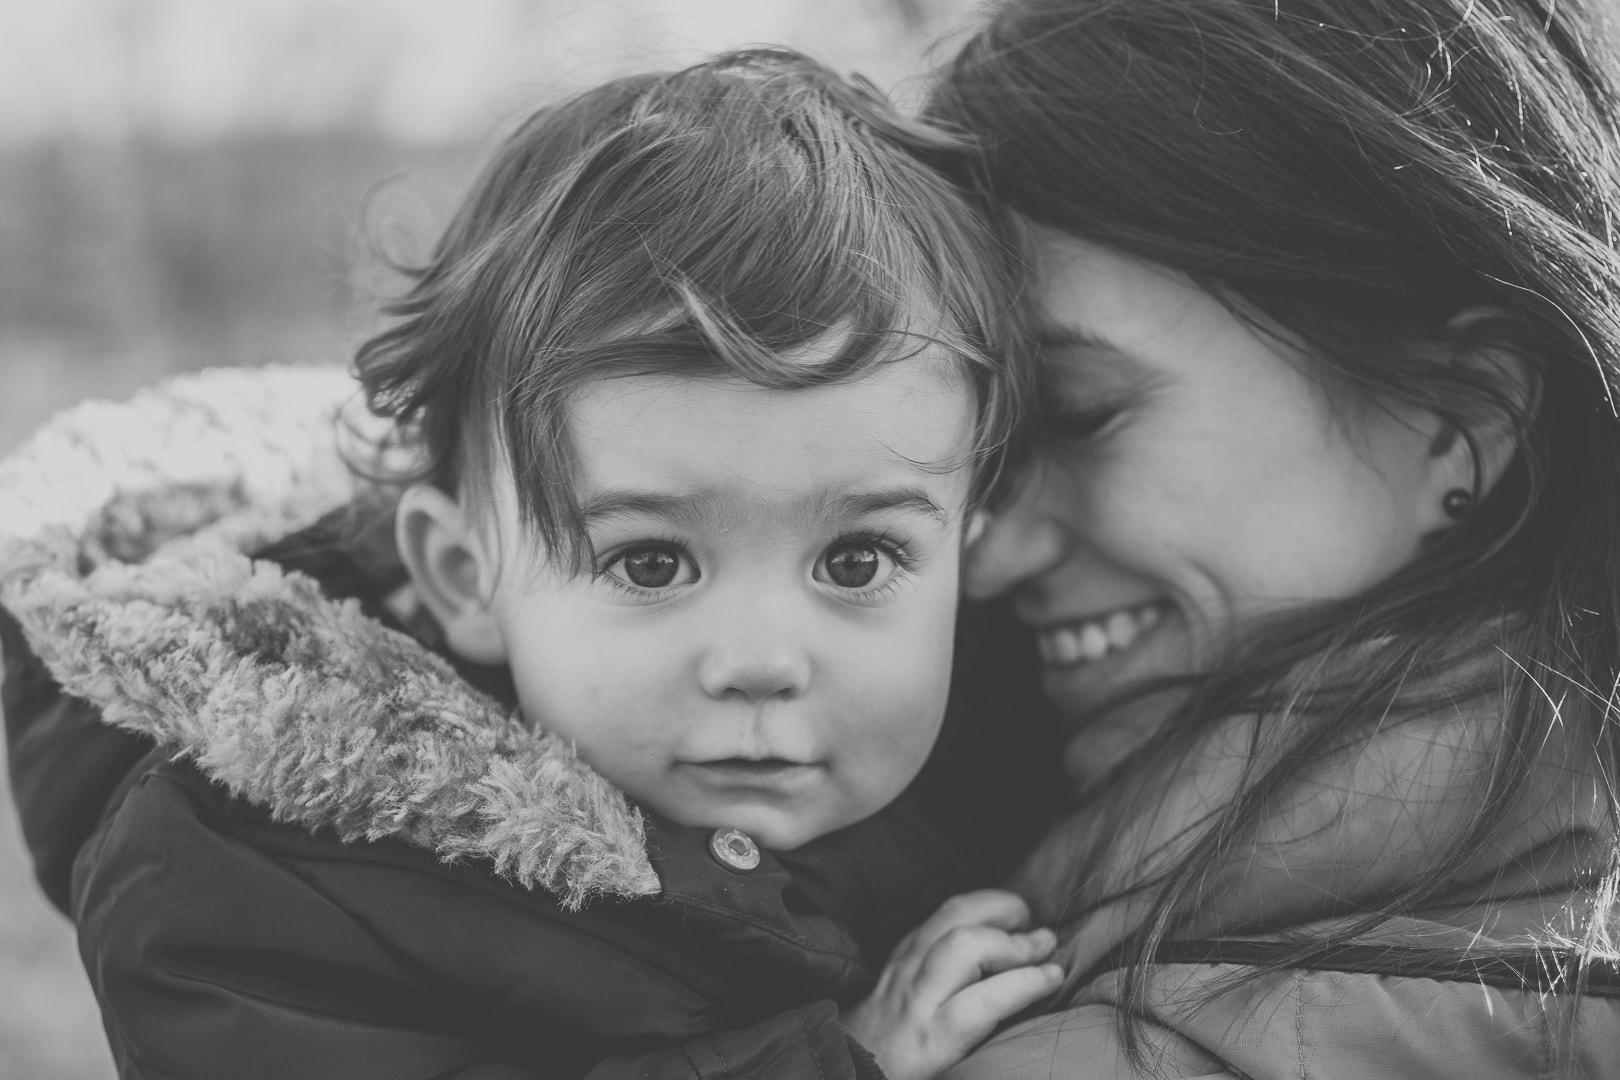 trezors-photography-photographe-professionnel-toulouse-31-enfance-seance-famille-lifestyle (10)